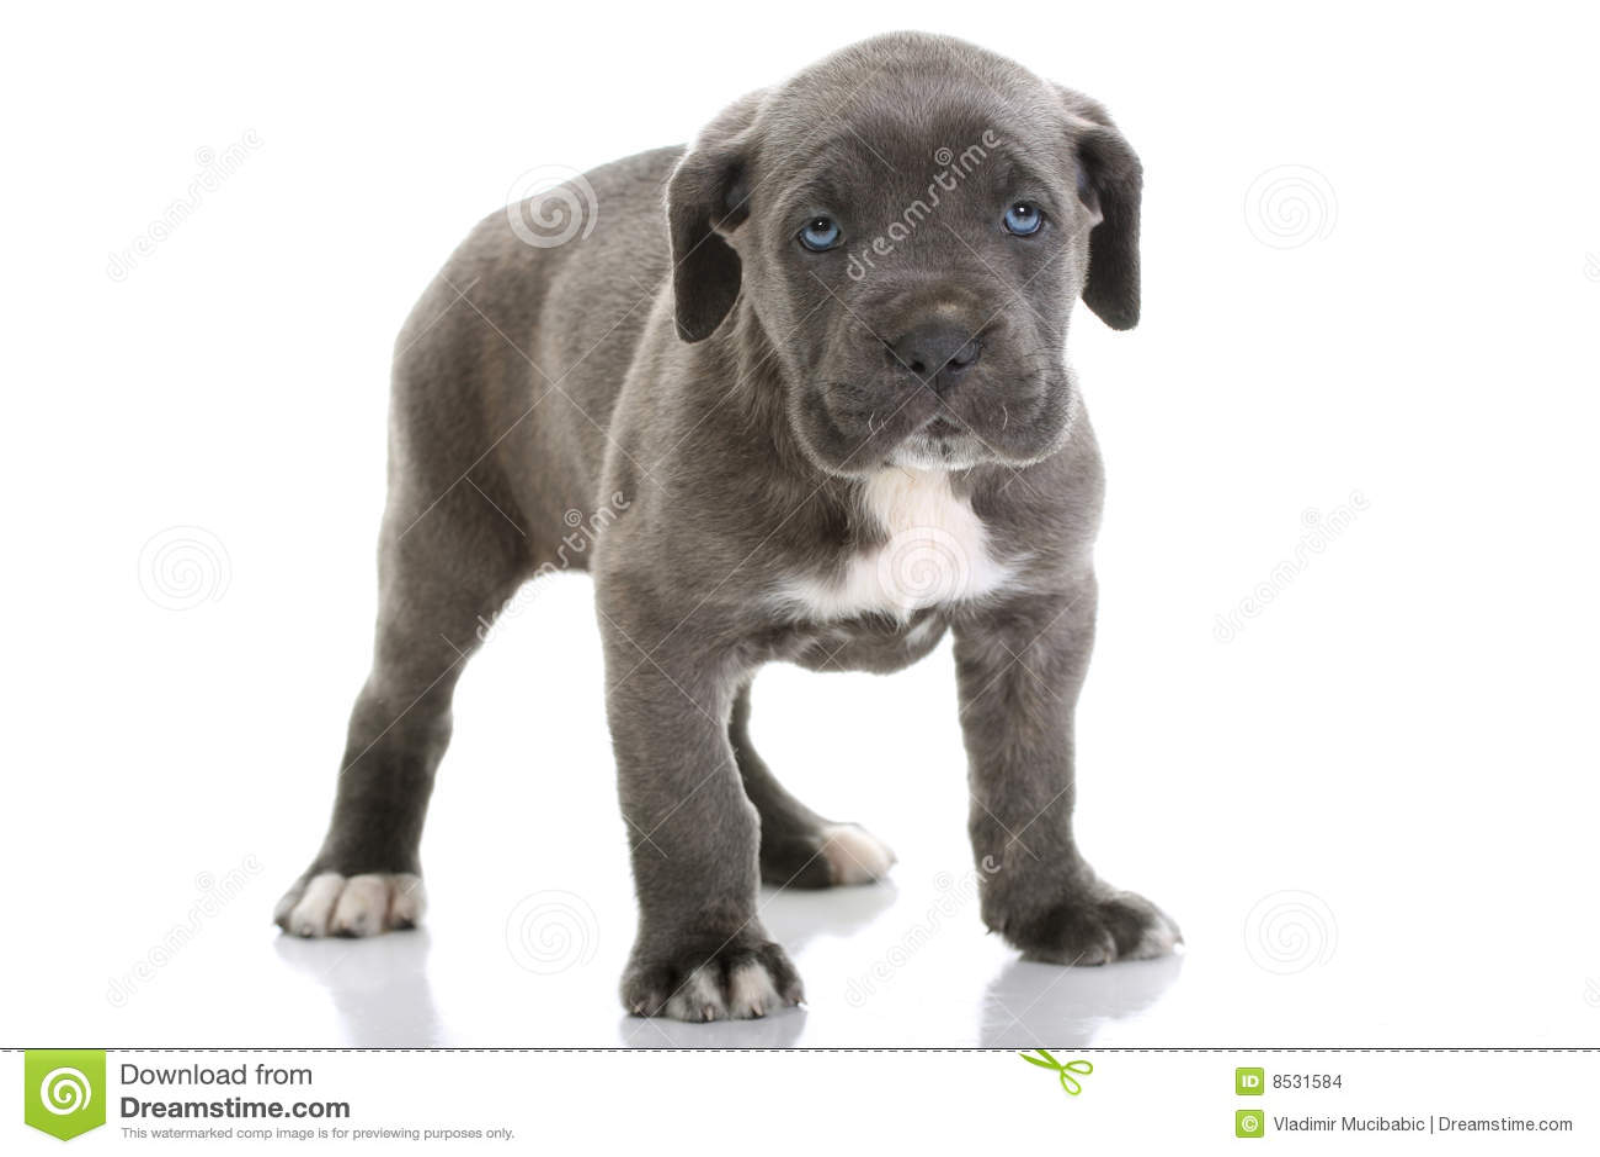 Puppy Italian Mastiff Cane Corso Stock Images - Image: 8531584